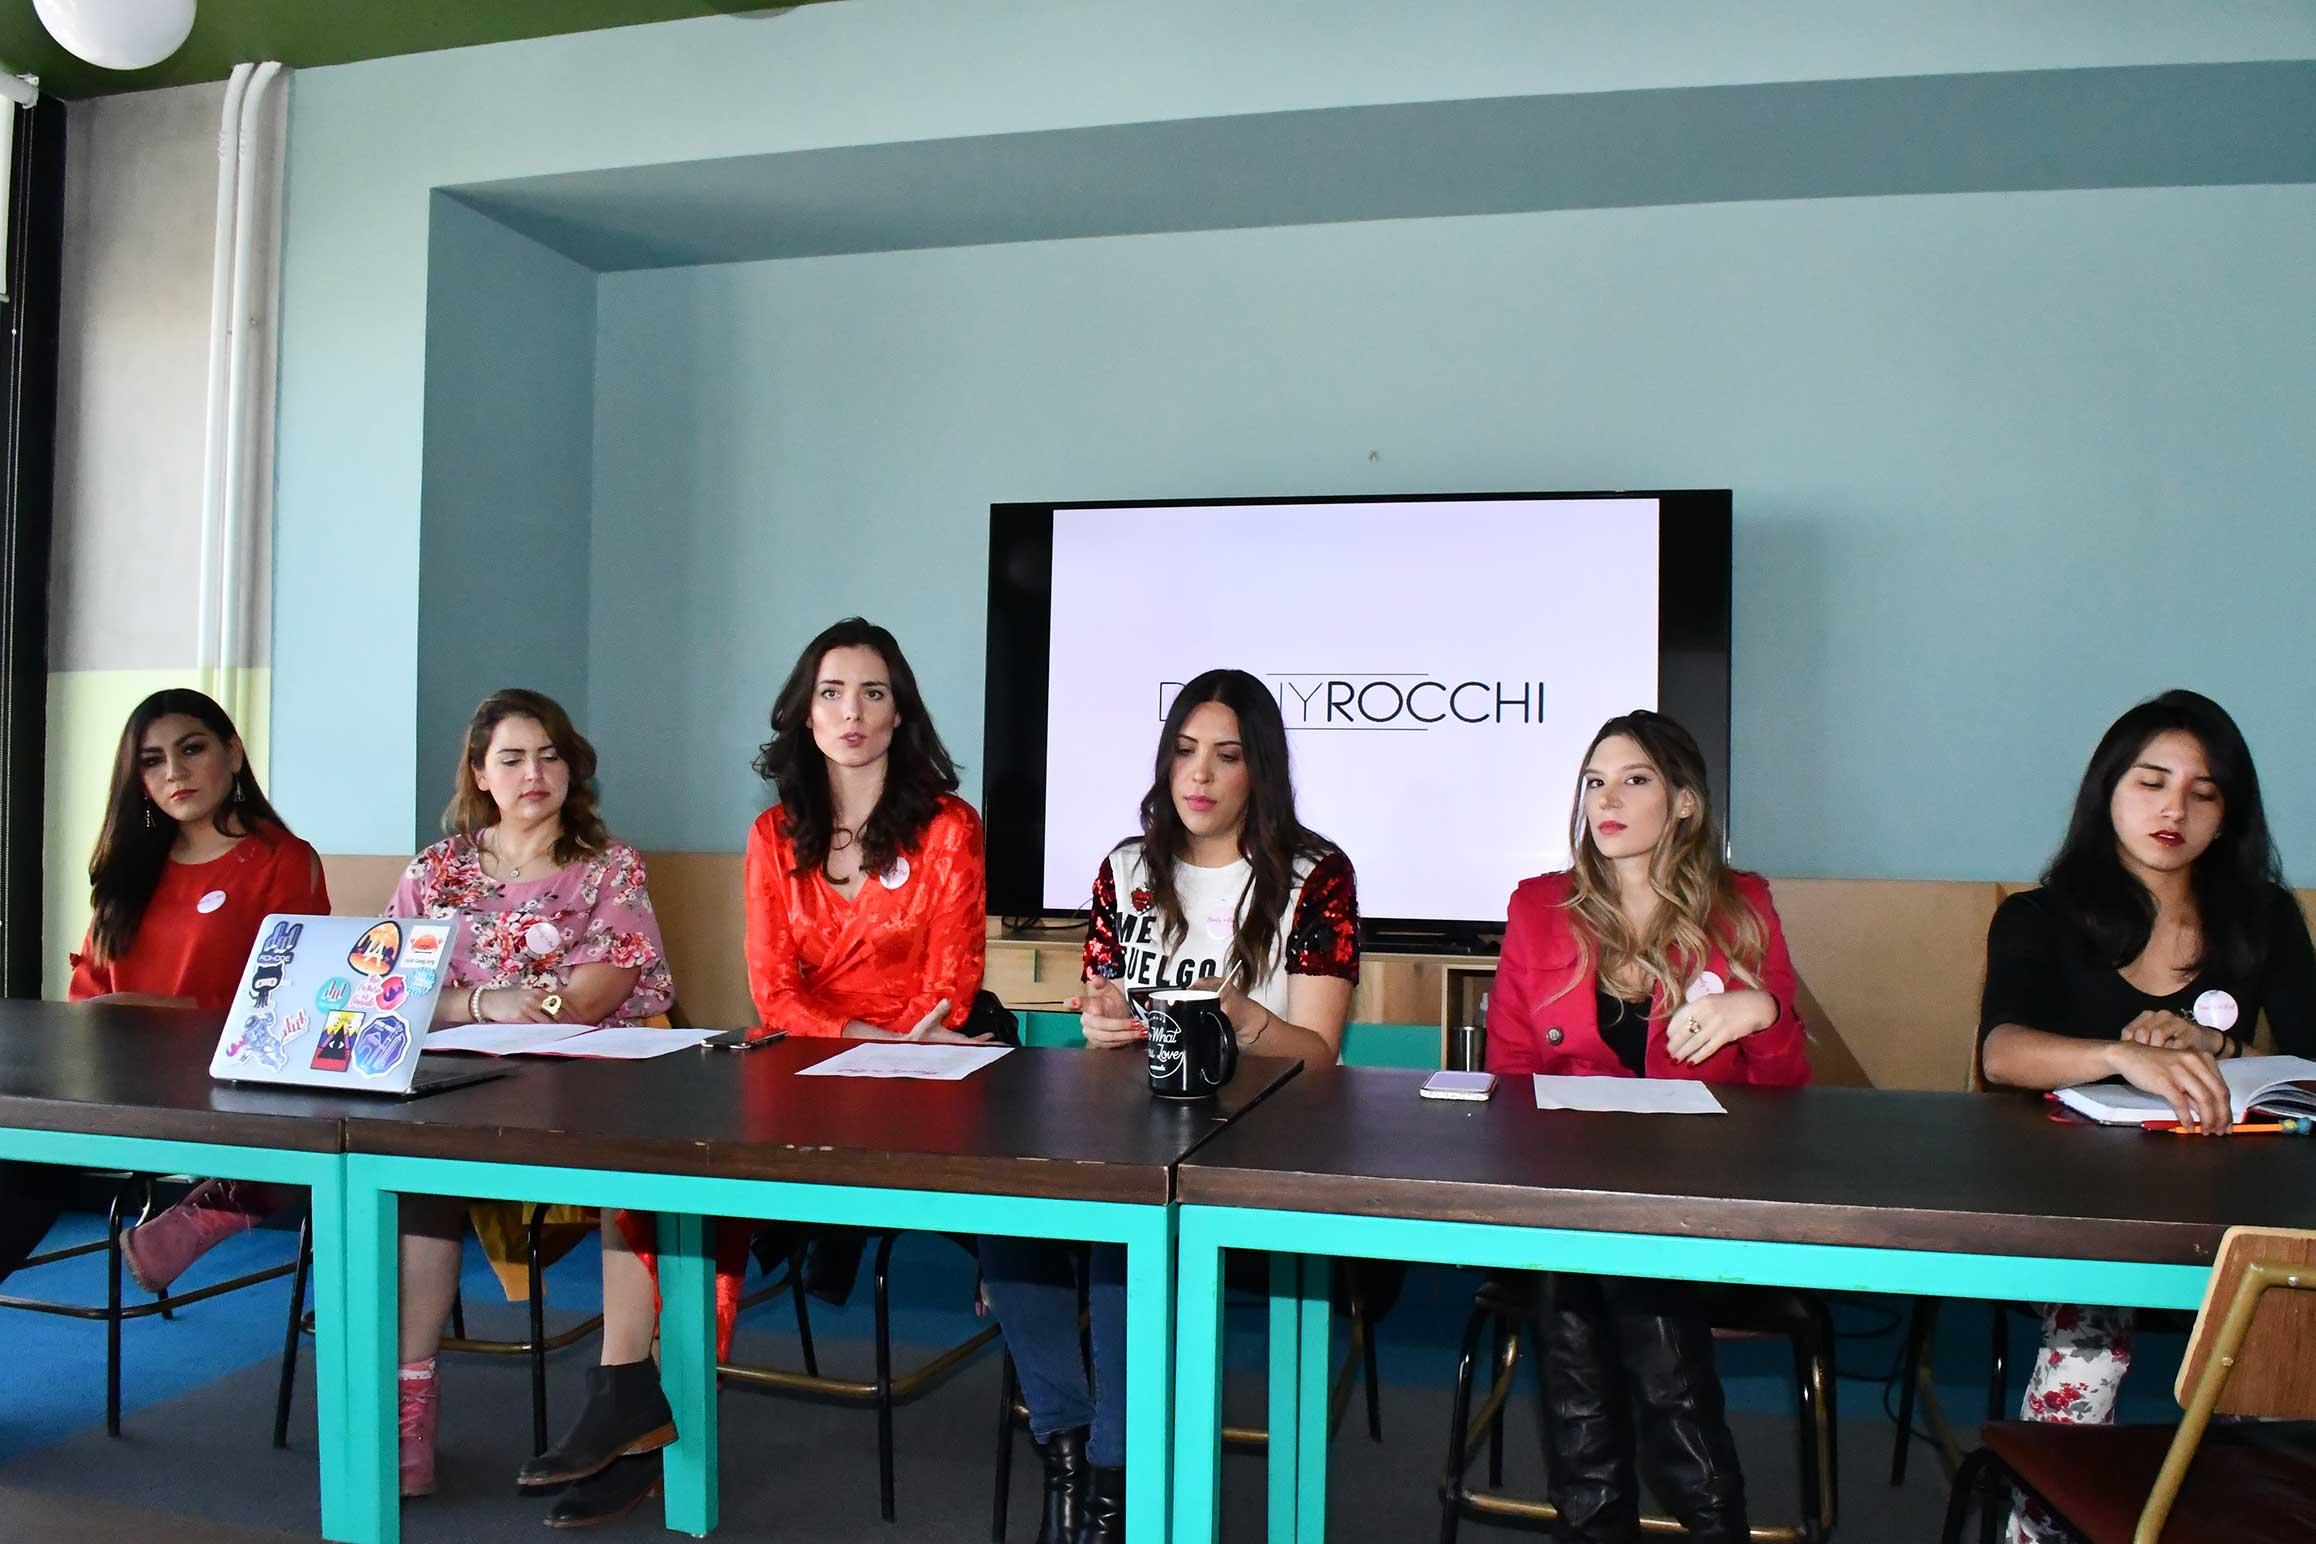 Jimena Gómez, Gabilú Mireles, Mara Matosic, Dany Rocchi, Andrea Noriega y Lolo Roho